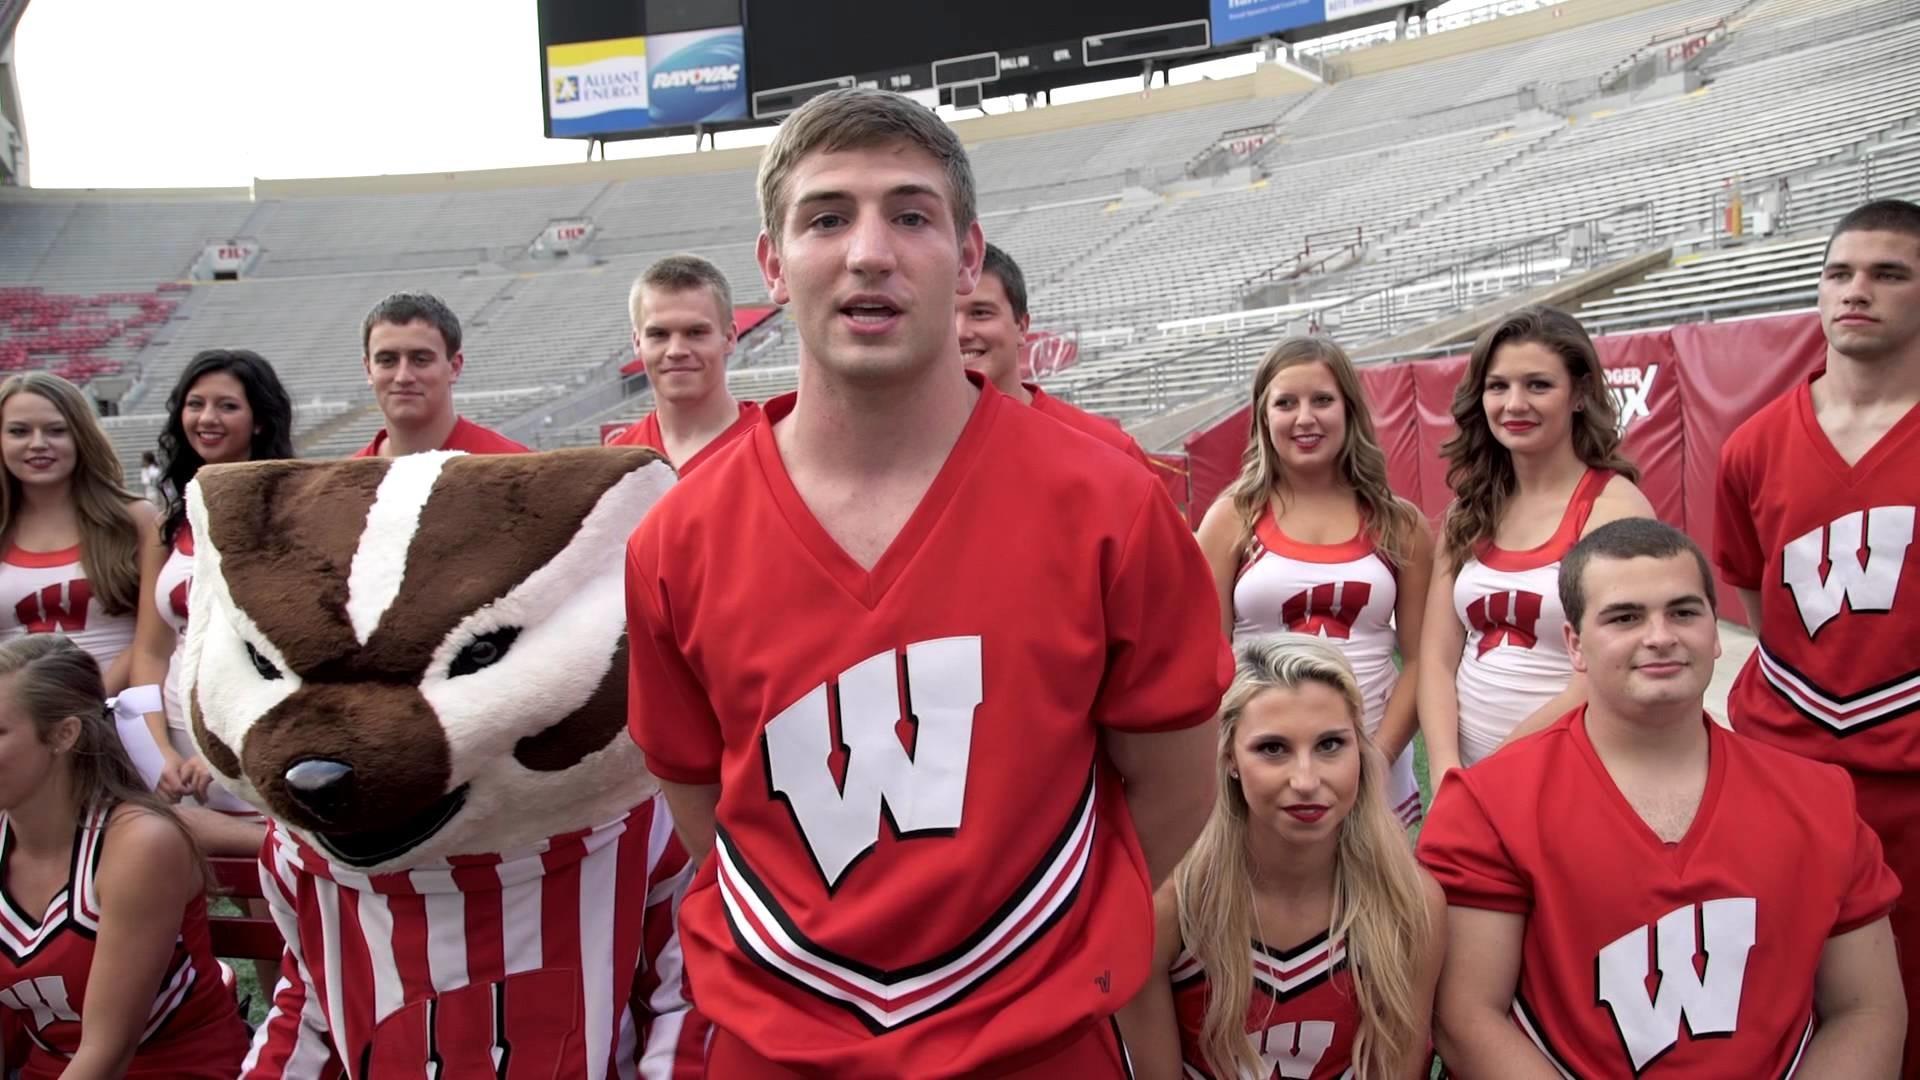 Res: 1920x1080, Wisconsin Spirit Squad and Bucky Badger #ALSicebucketchallenge